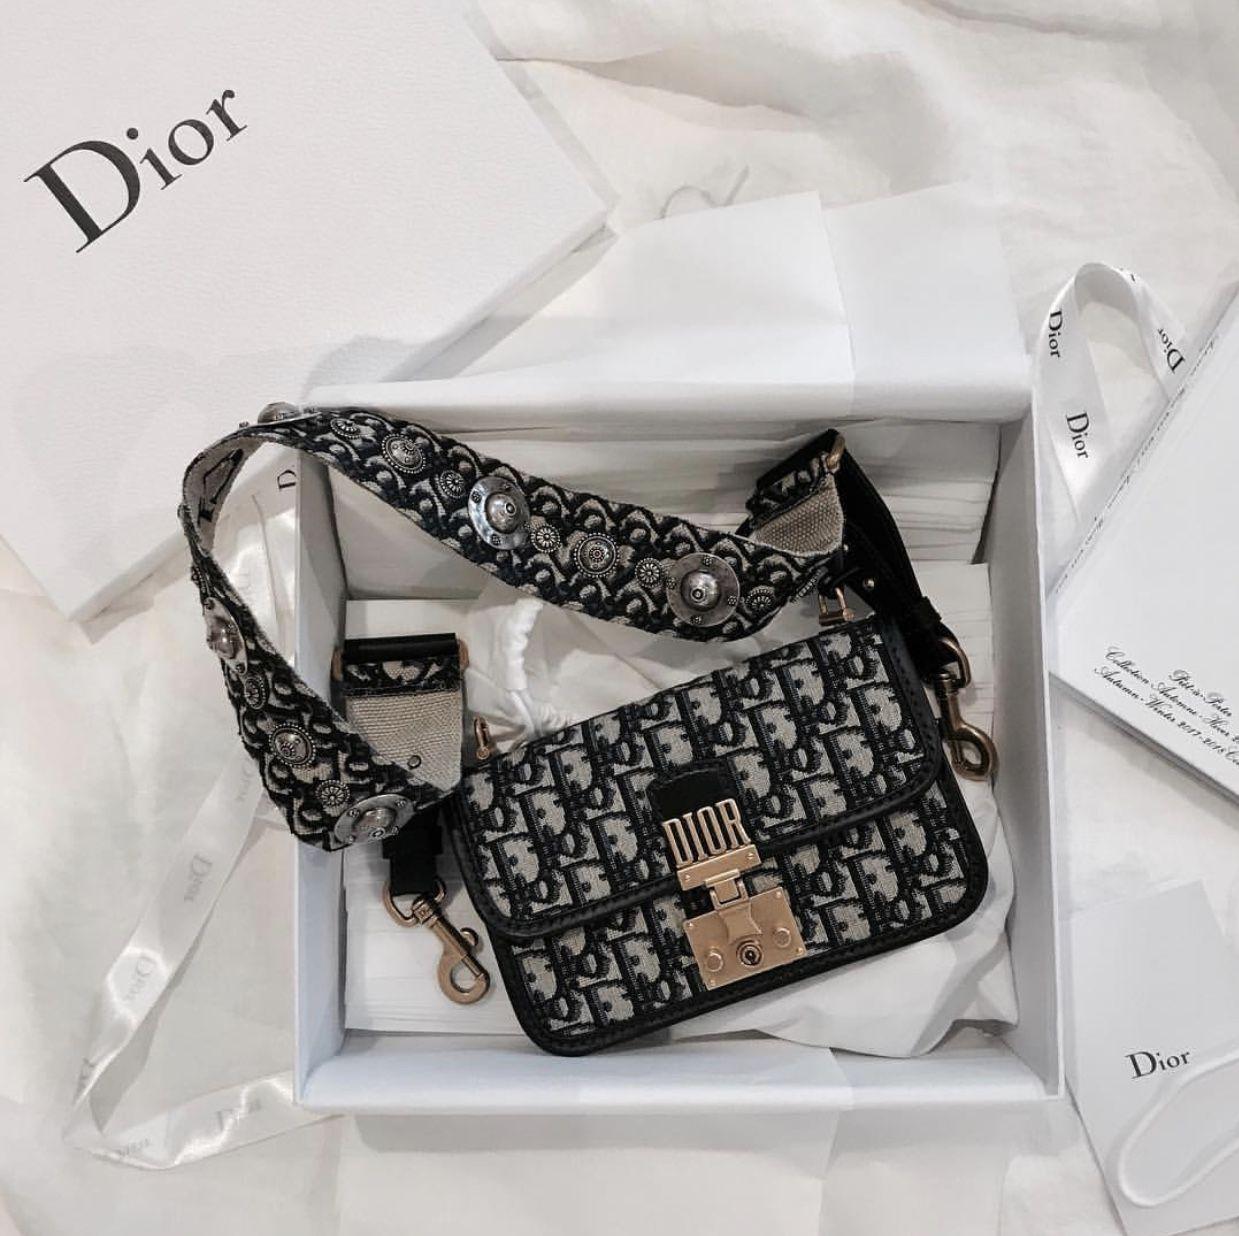 43b6e9ee09 Dior Addict Flap Bag in Dior Oblique Canvas